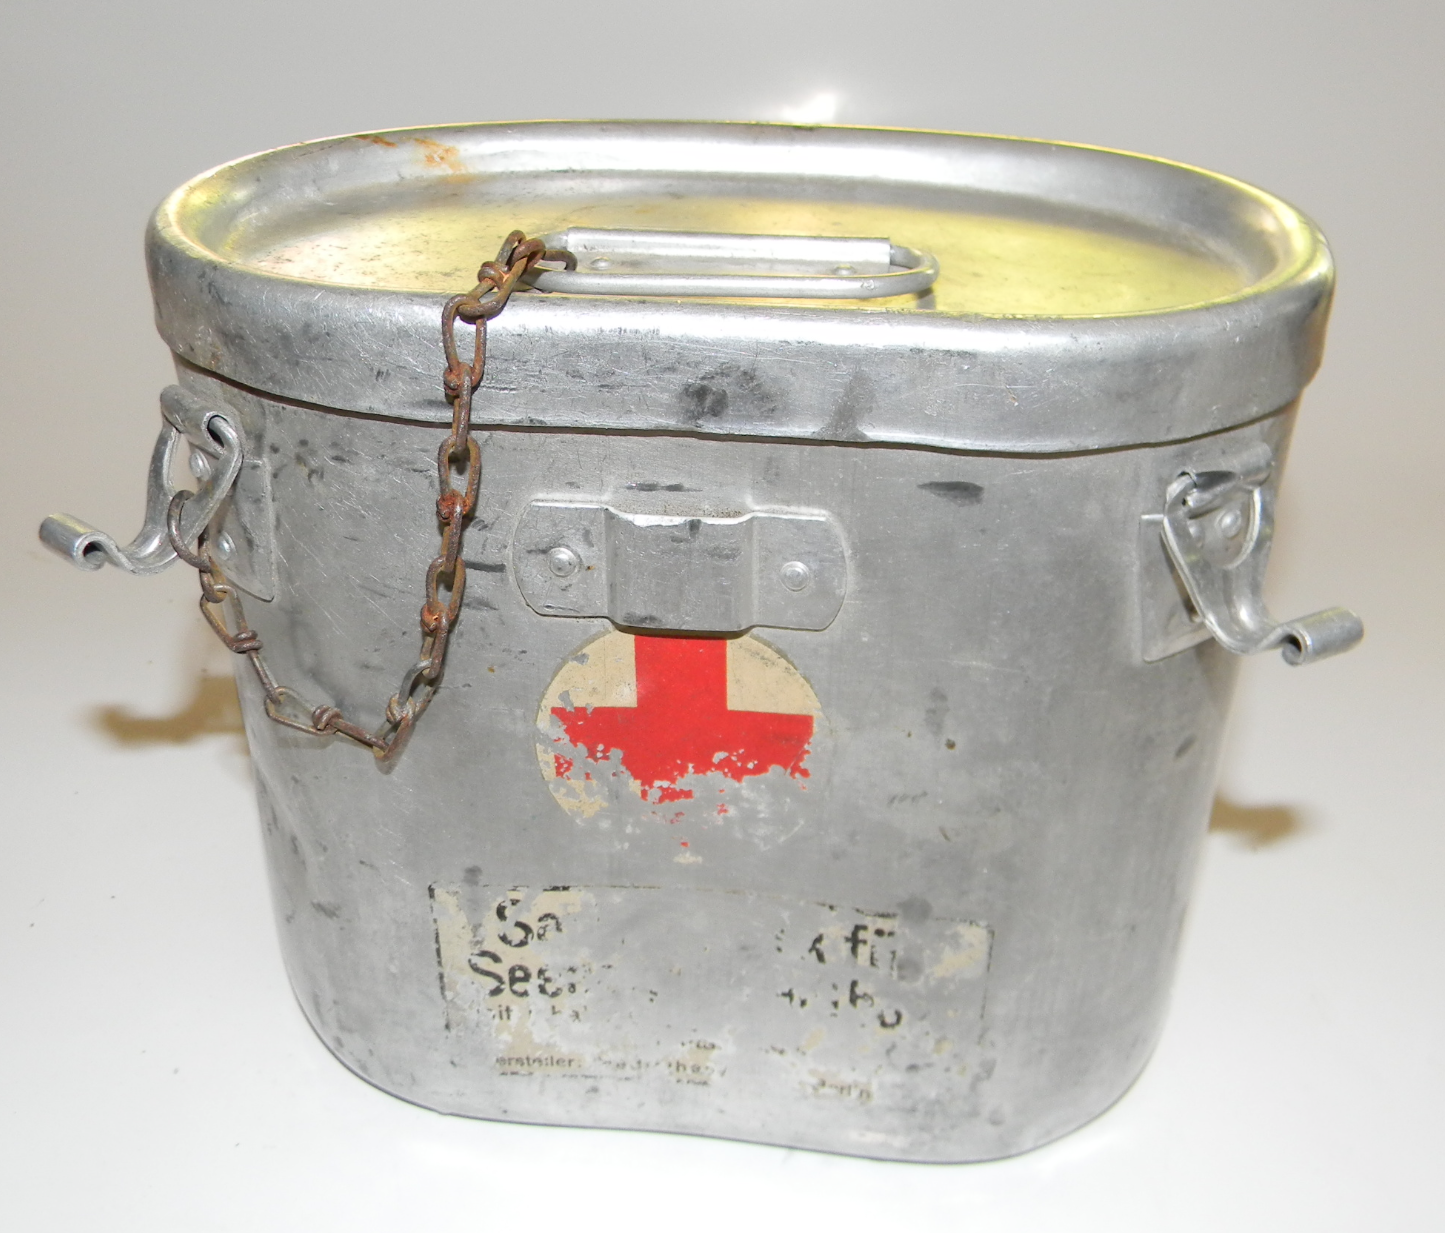 LW Sanitatspak (empty)